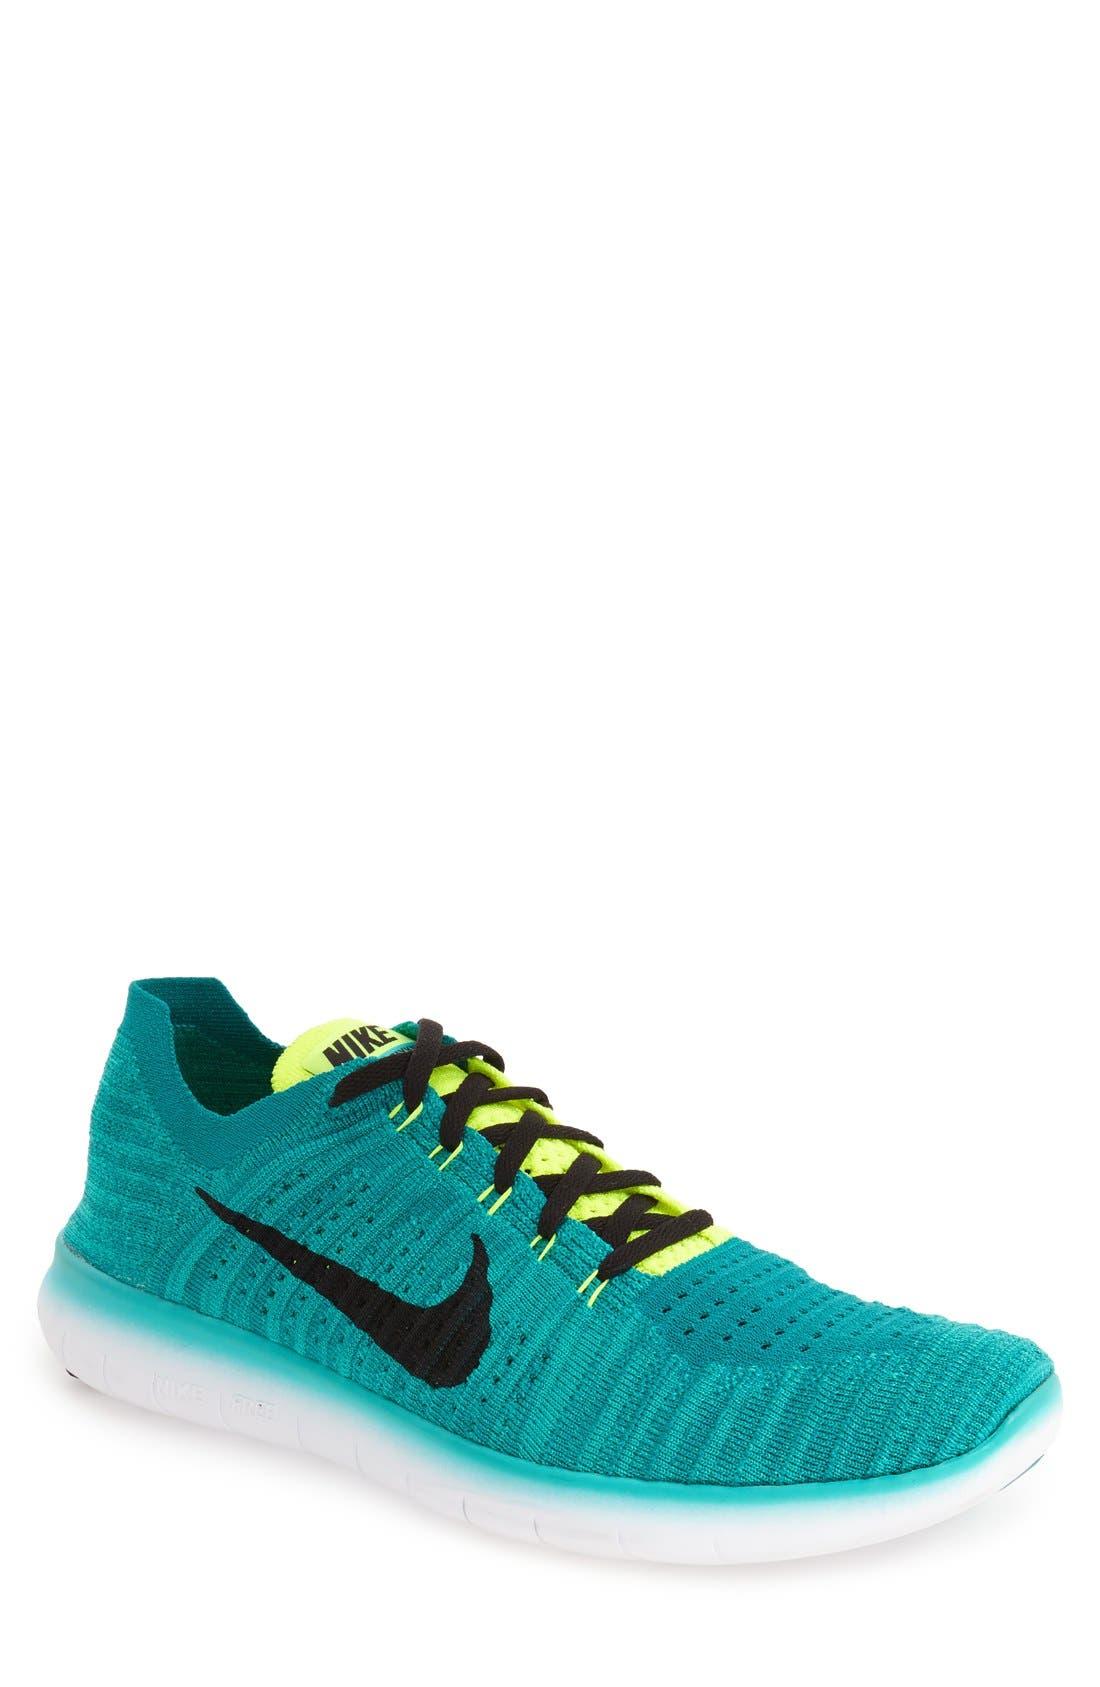 Main Image - Nike 'Free Run Flyknit' Running Shoe (Men)